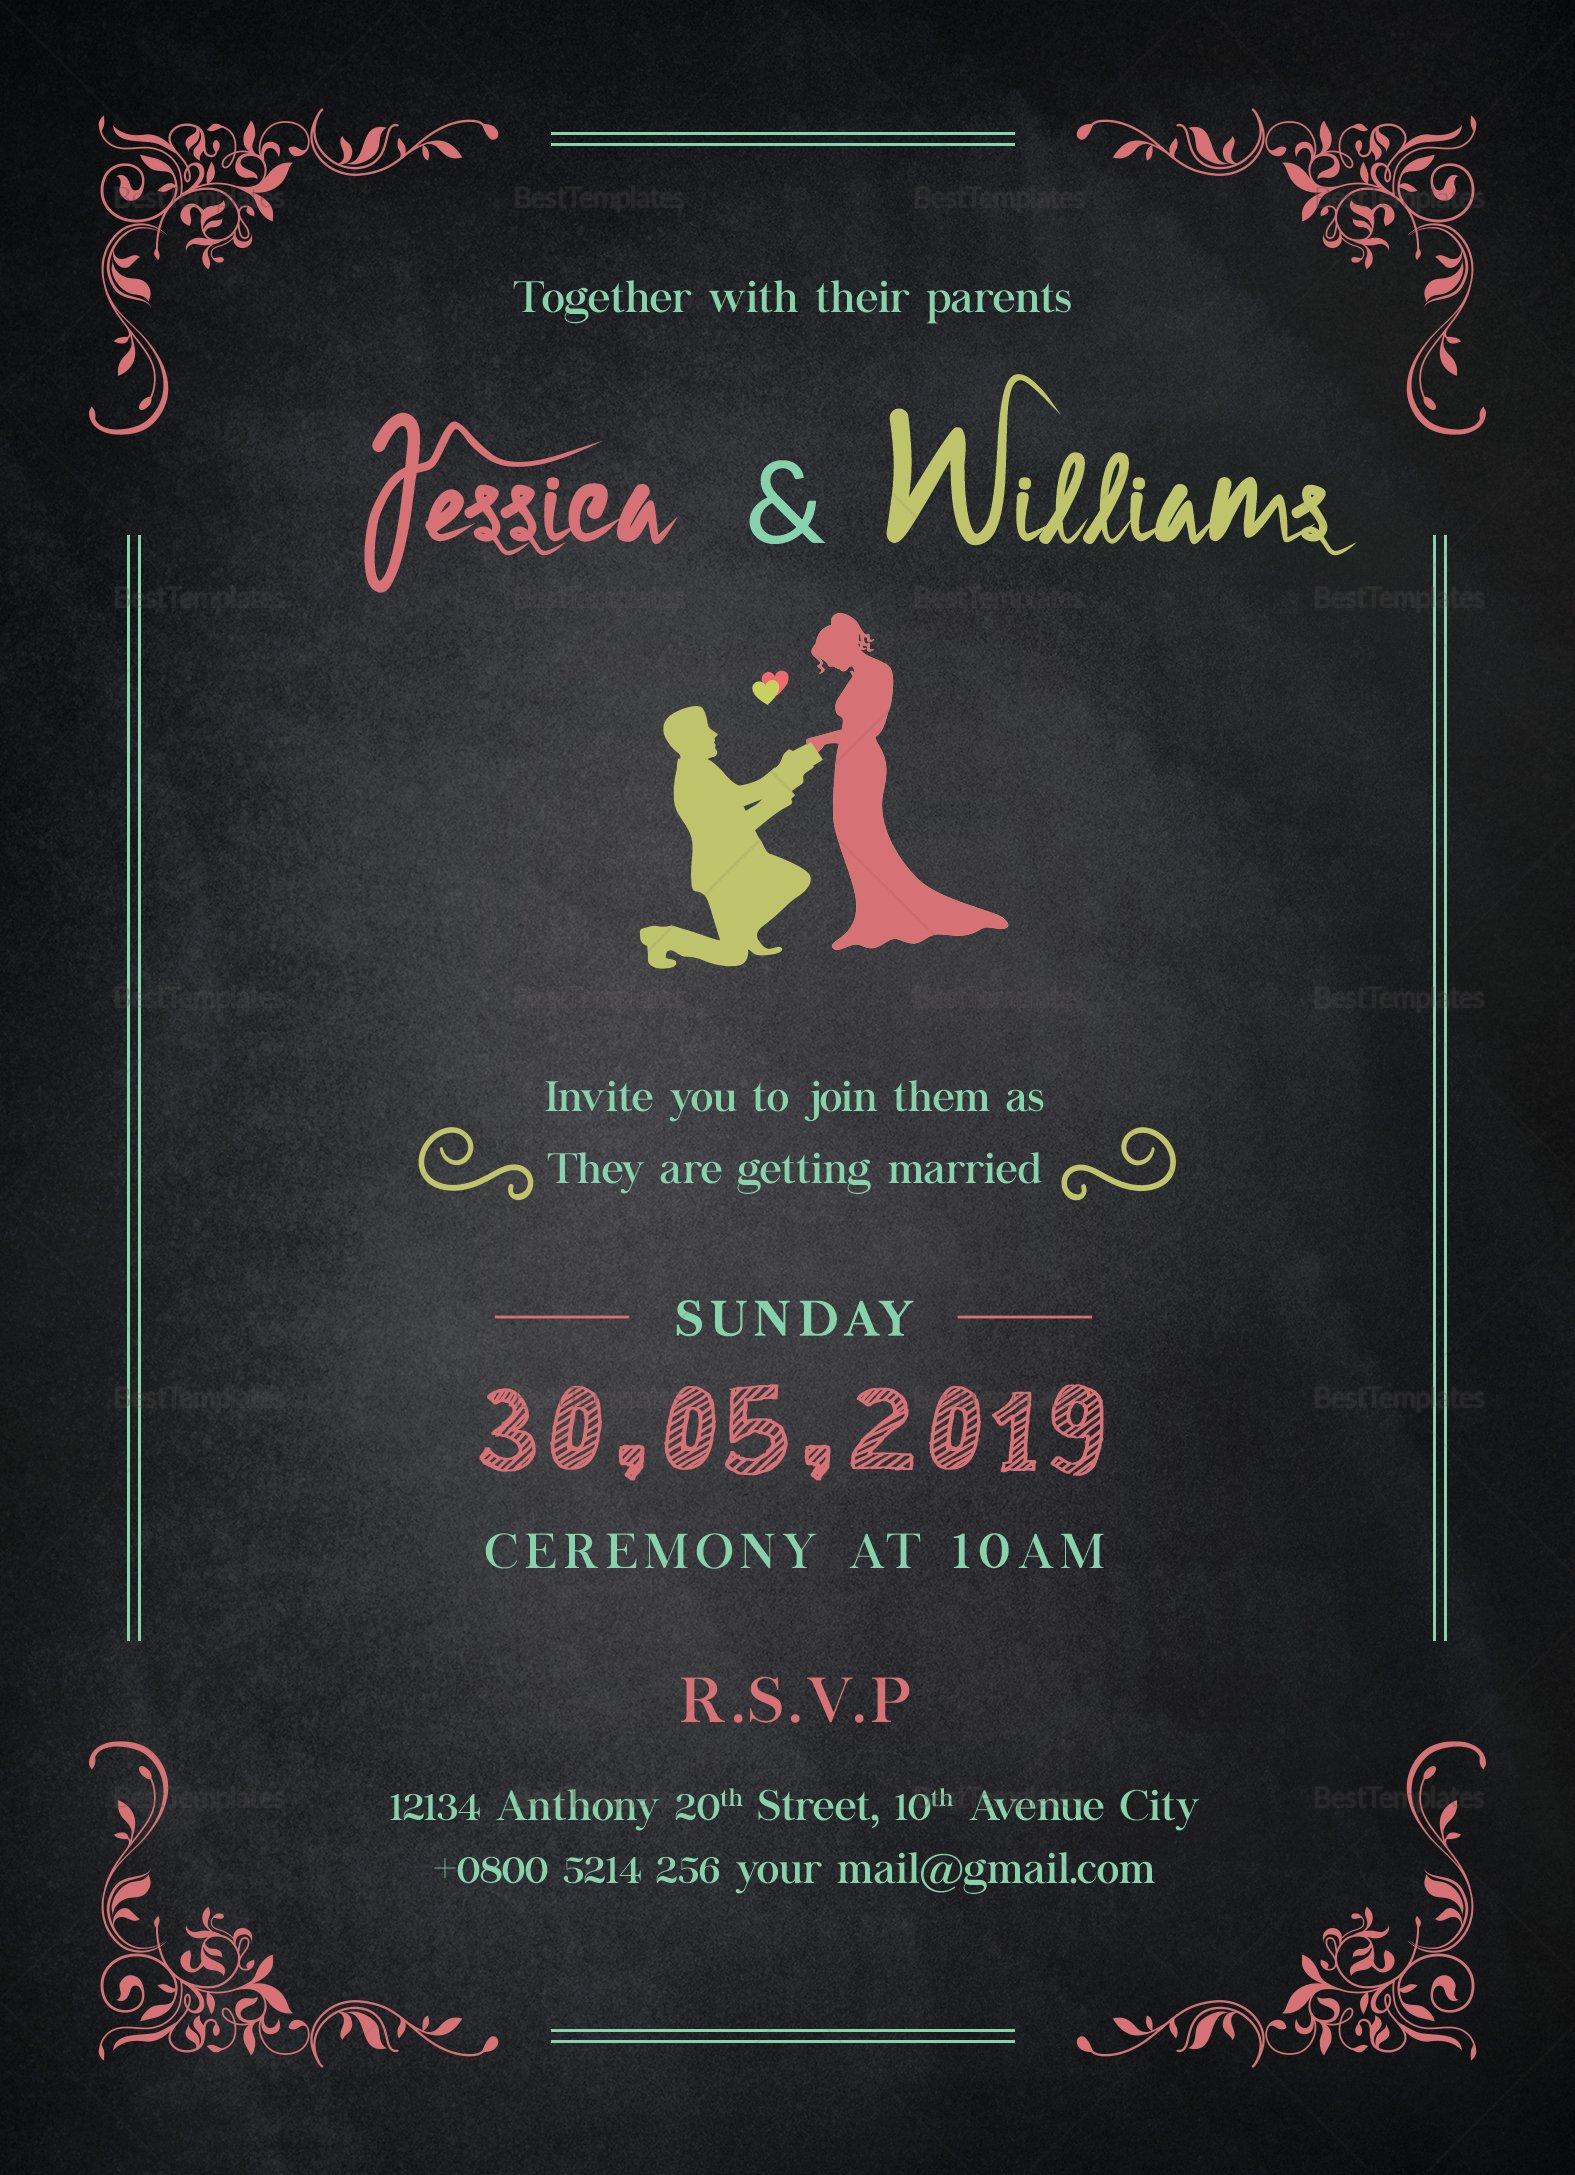 Chalkboard Template Microsoft Word Beautiful Chalkboard Wedding Invitation Design Template In Word Psd